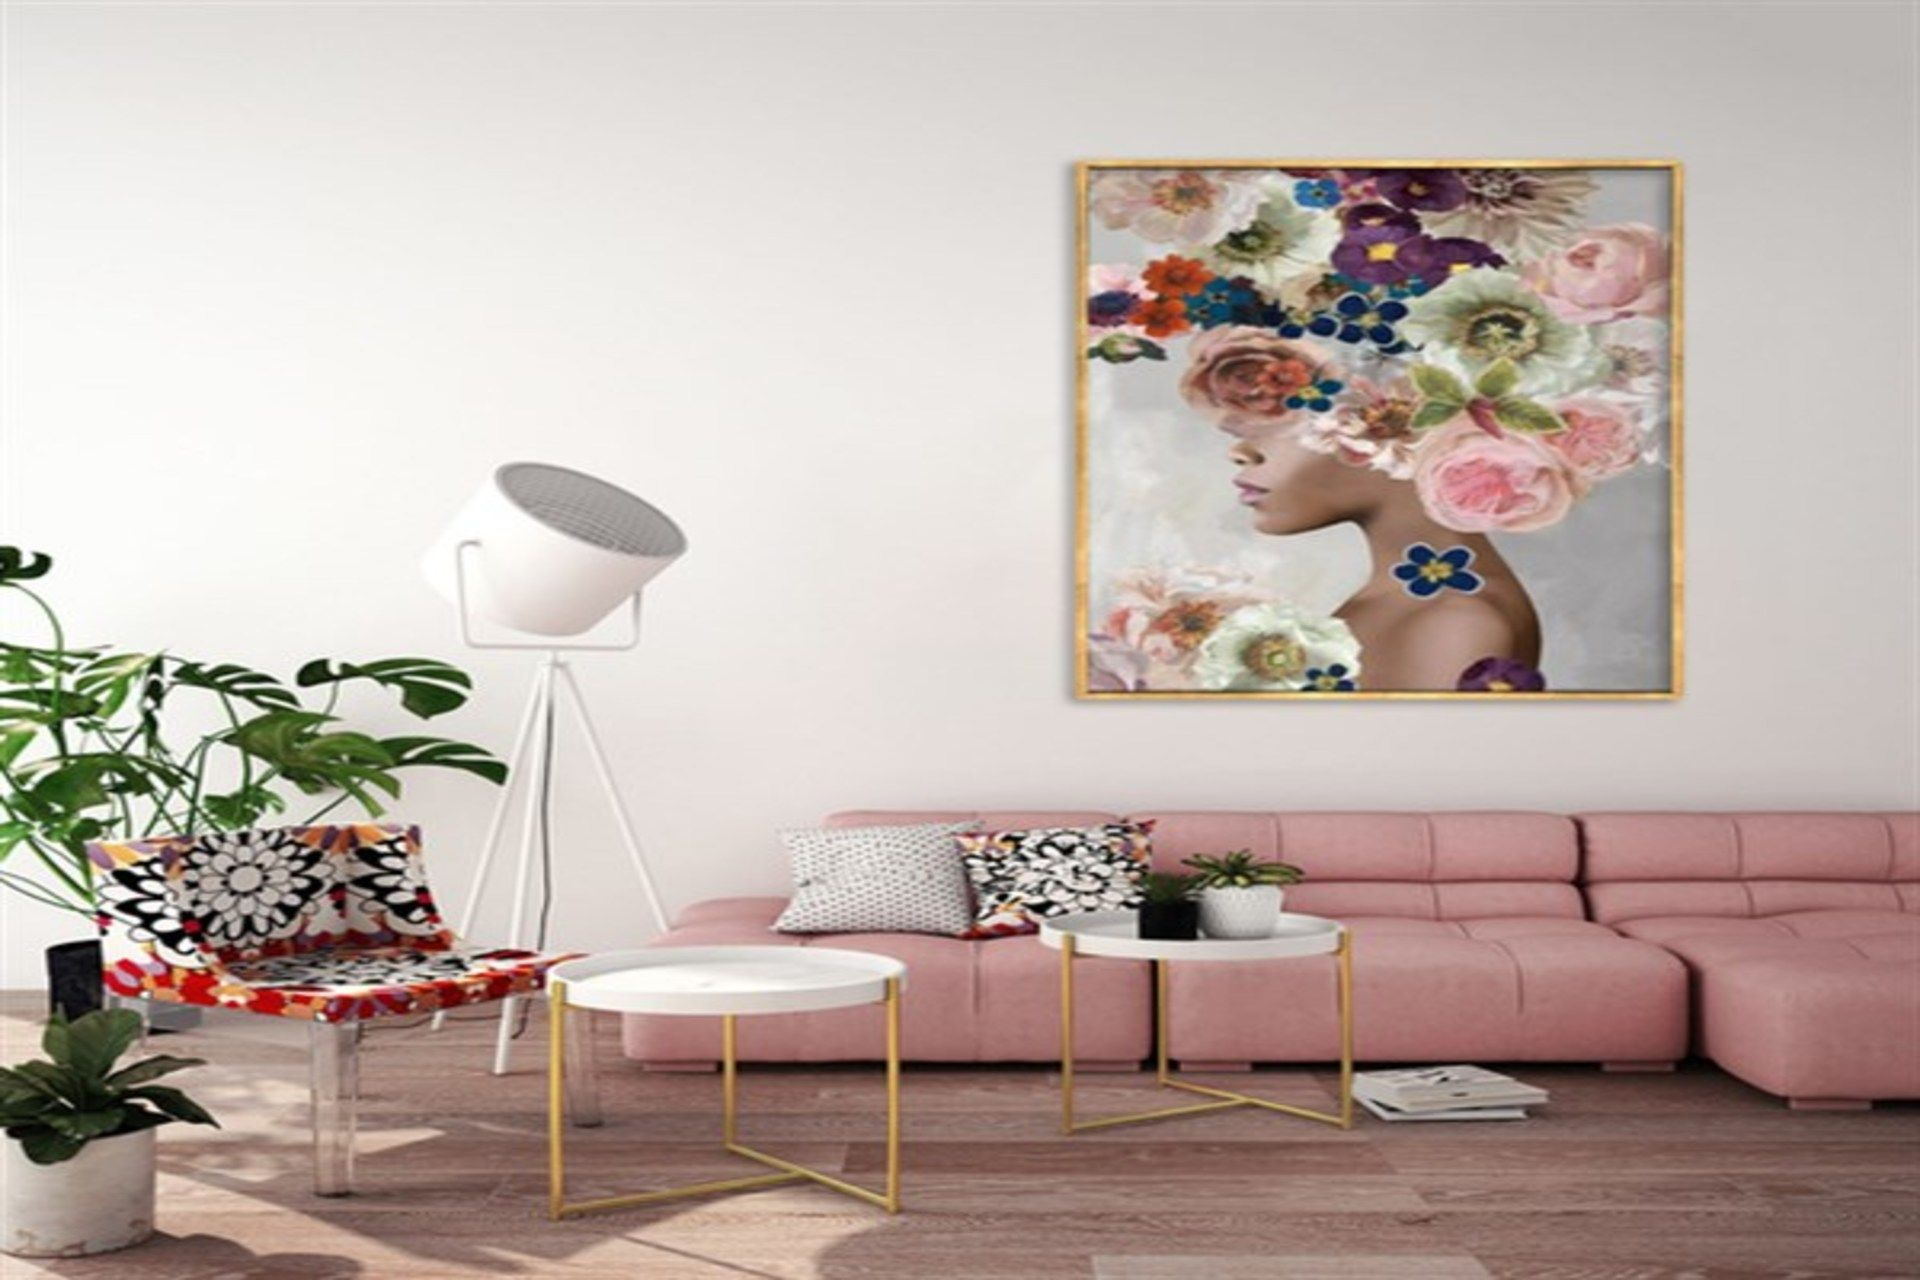 TABLOLİFE WOMEN IN FLOWERS 2 YAĞLI BOYA DOKULU TABLO  75X100 CM